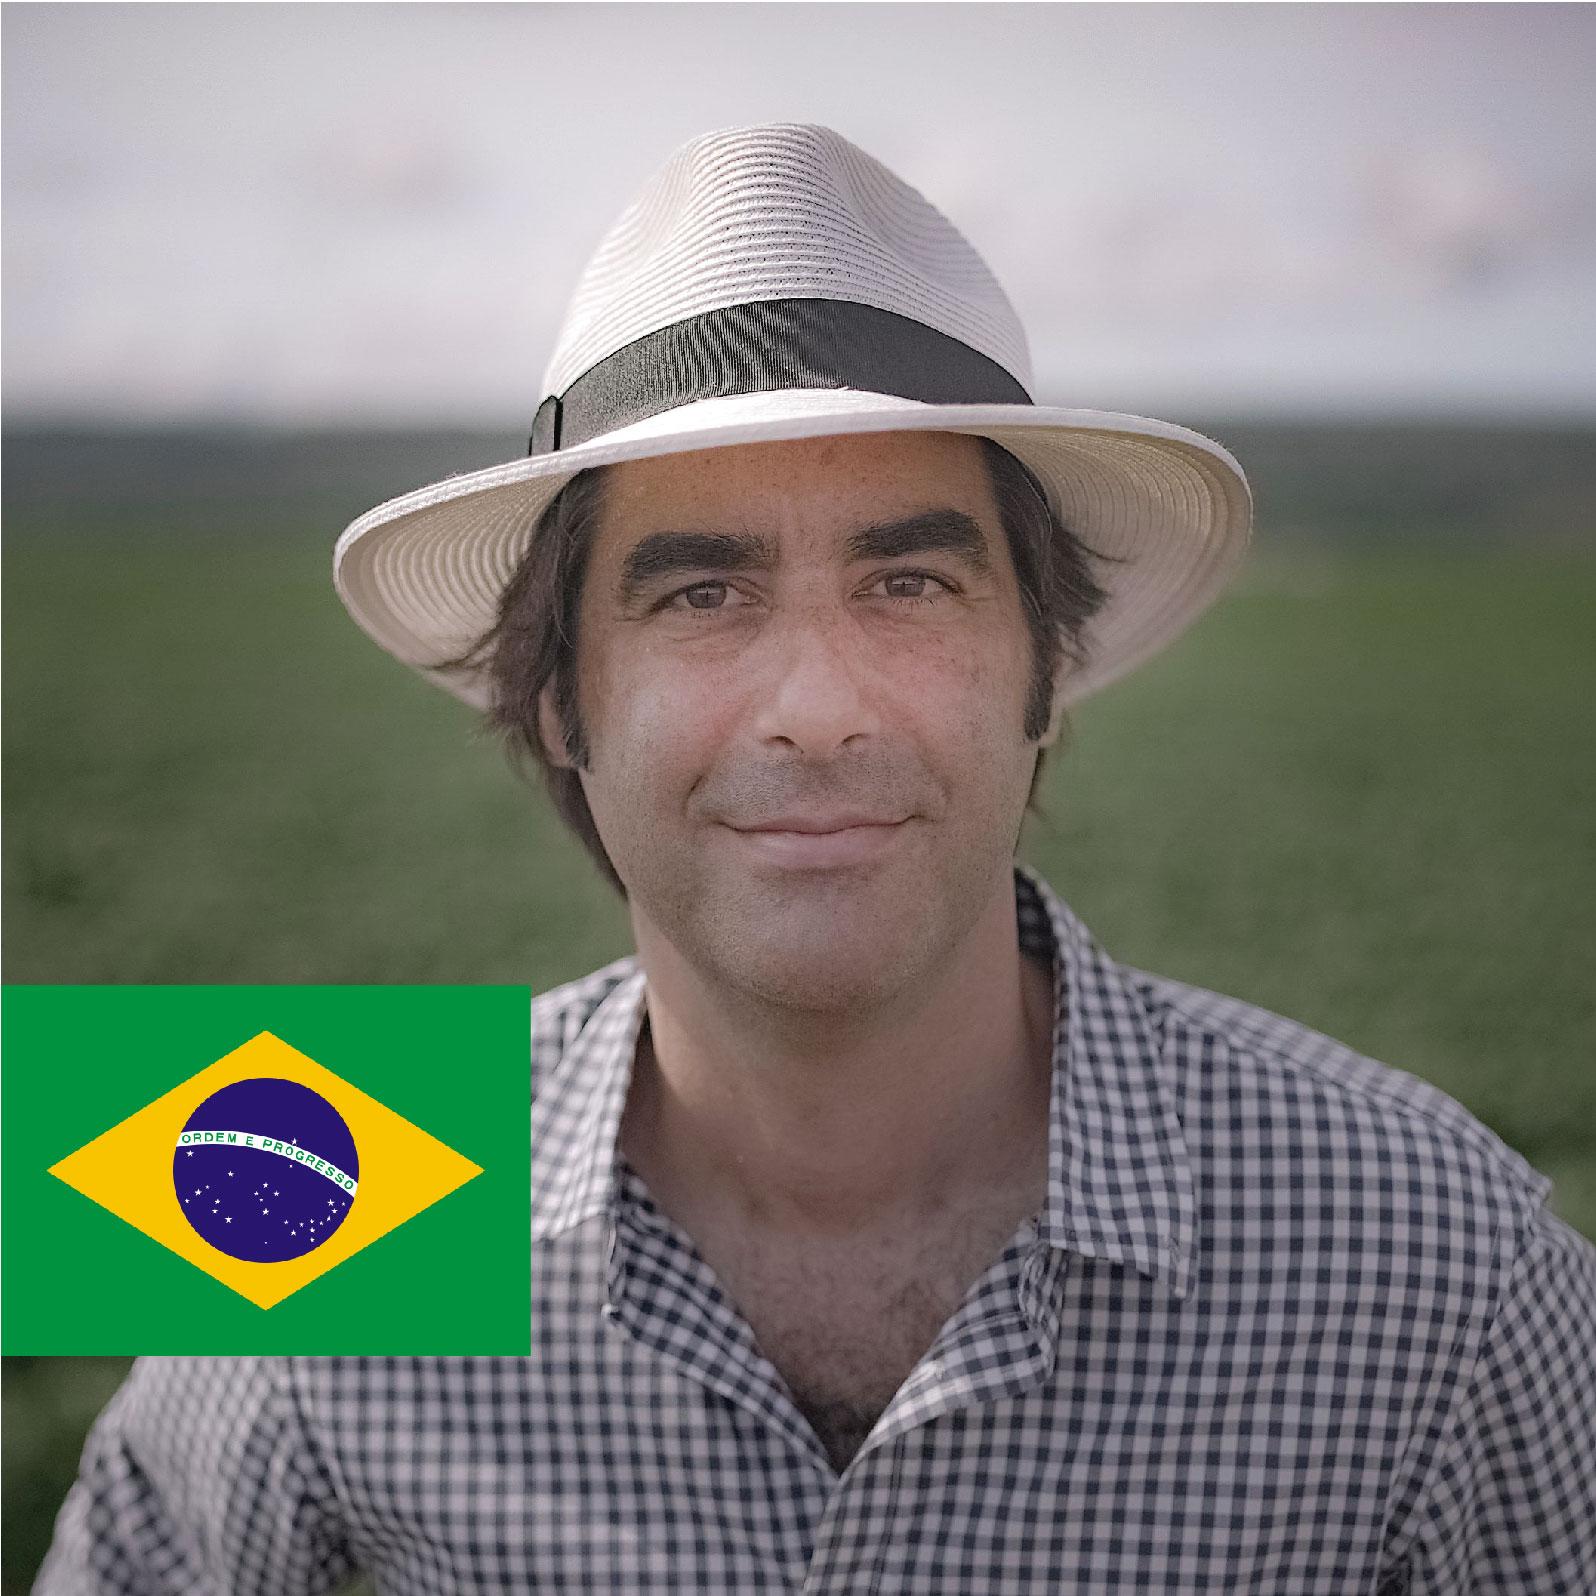 Бразилия Колибри Бленд Экоагрикола